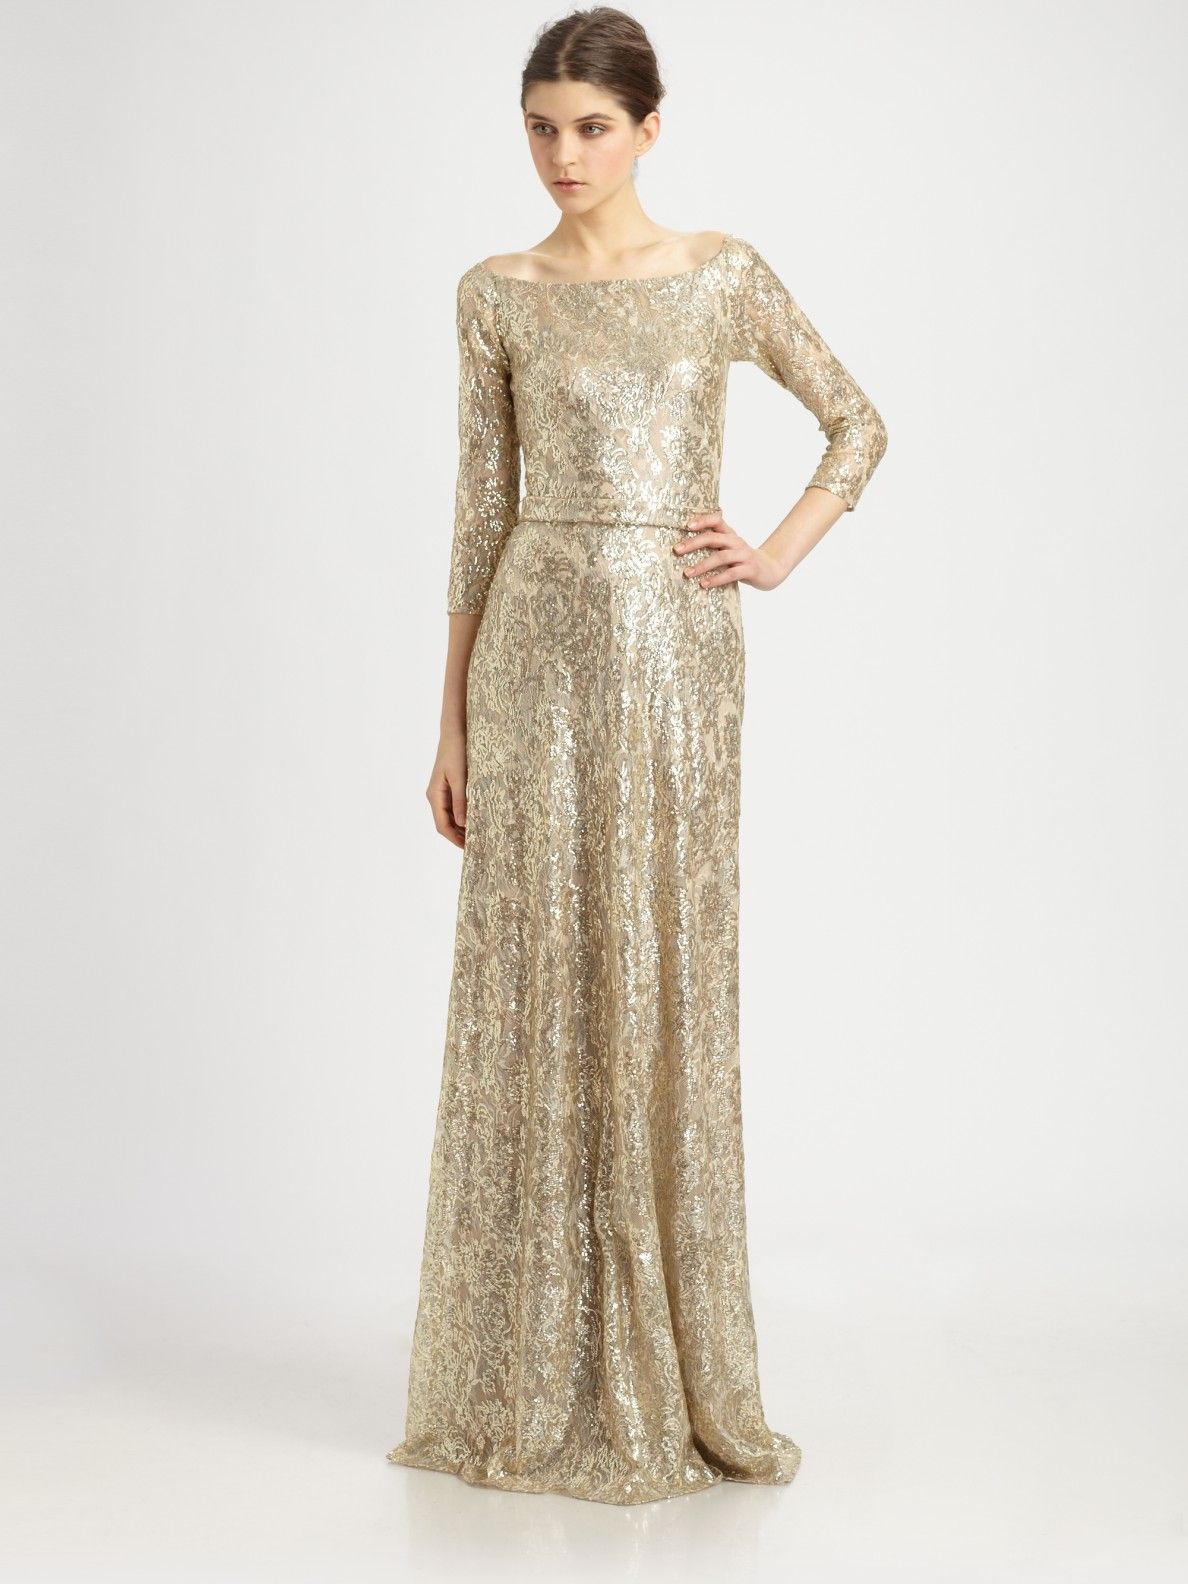 David Meister gold metallic lace gown | Women\'s Fashion | Pinterest ...